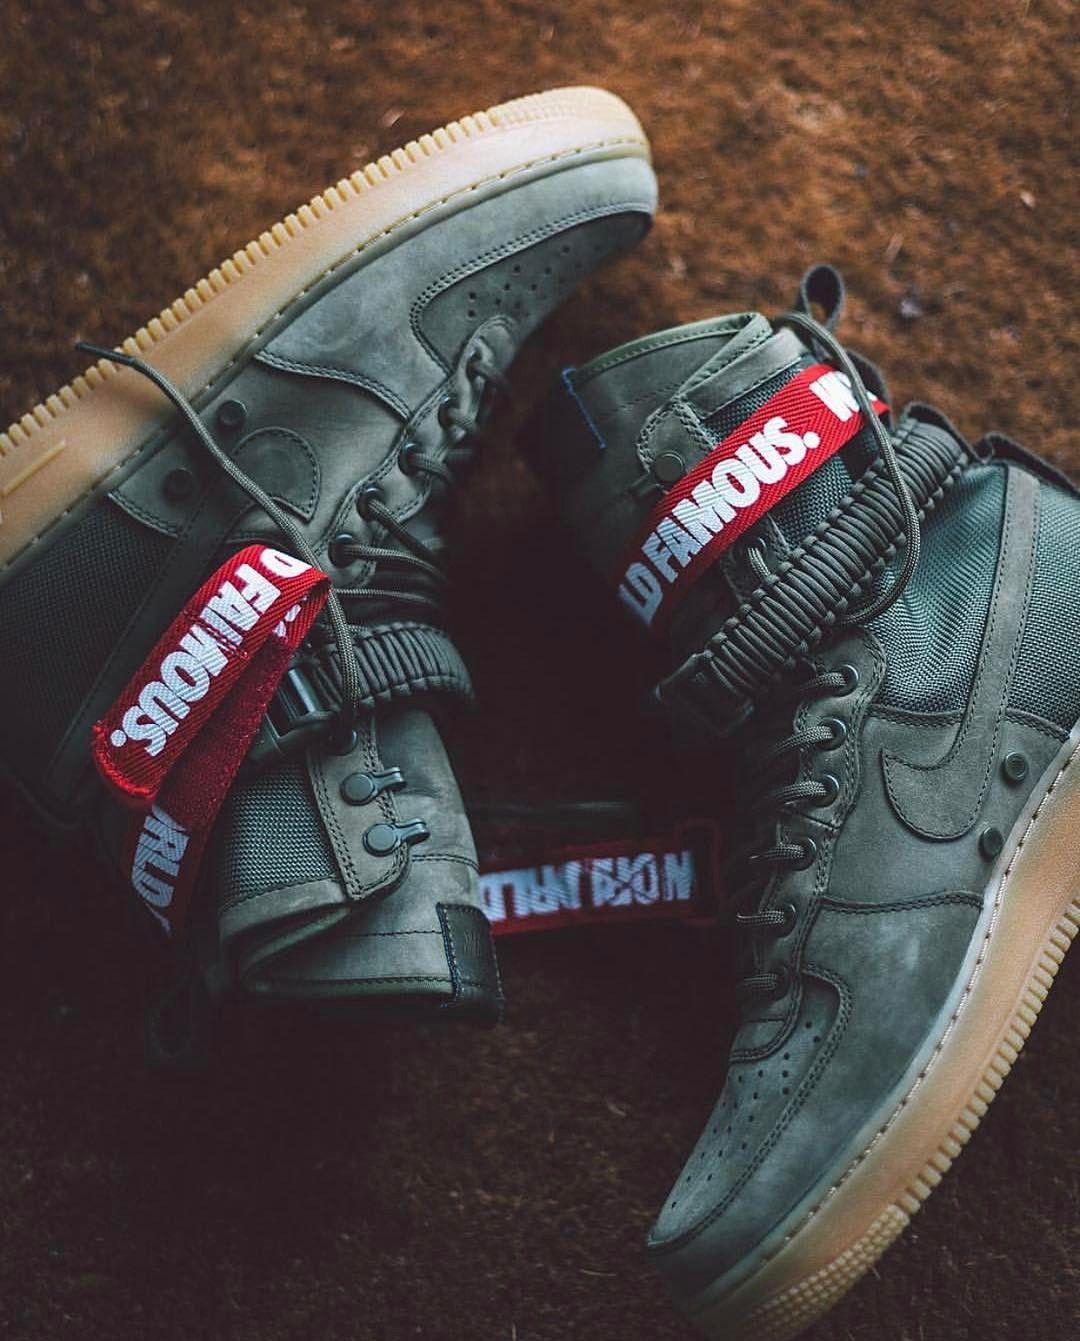 Nike Air Force 1 black suede · Fresh sneakers and vintage